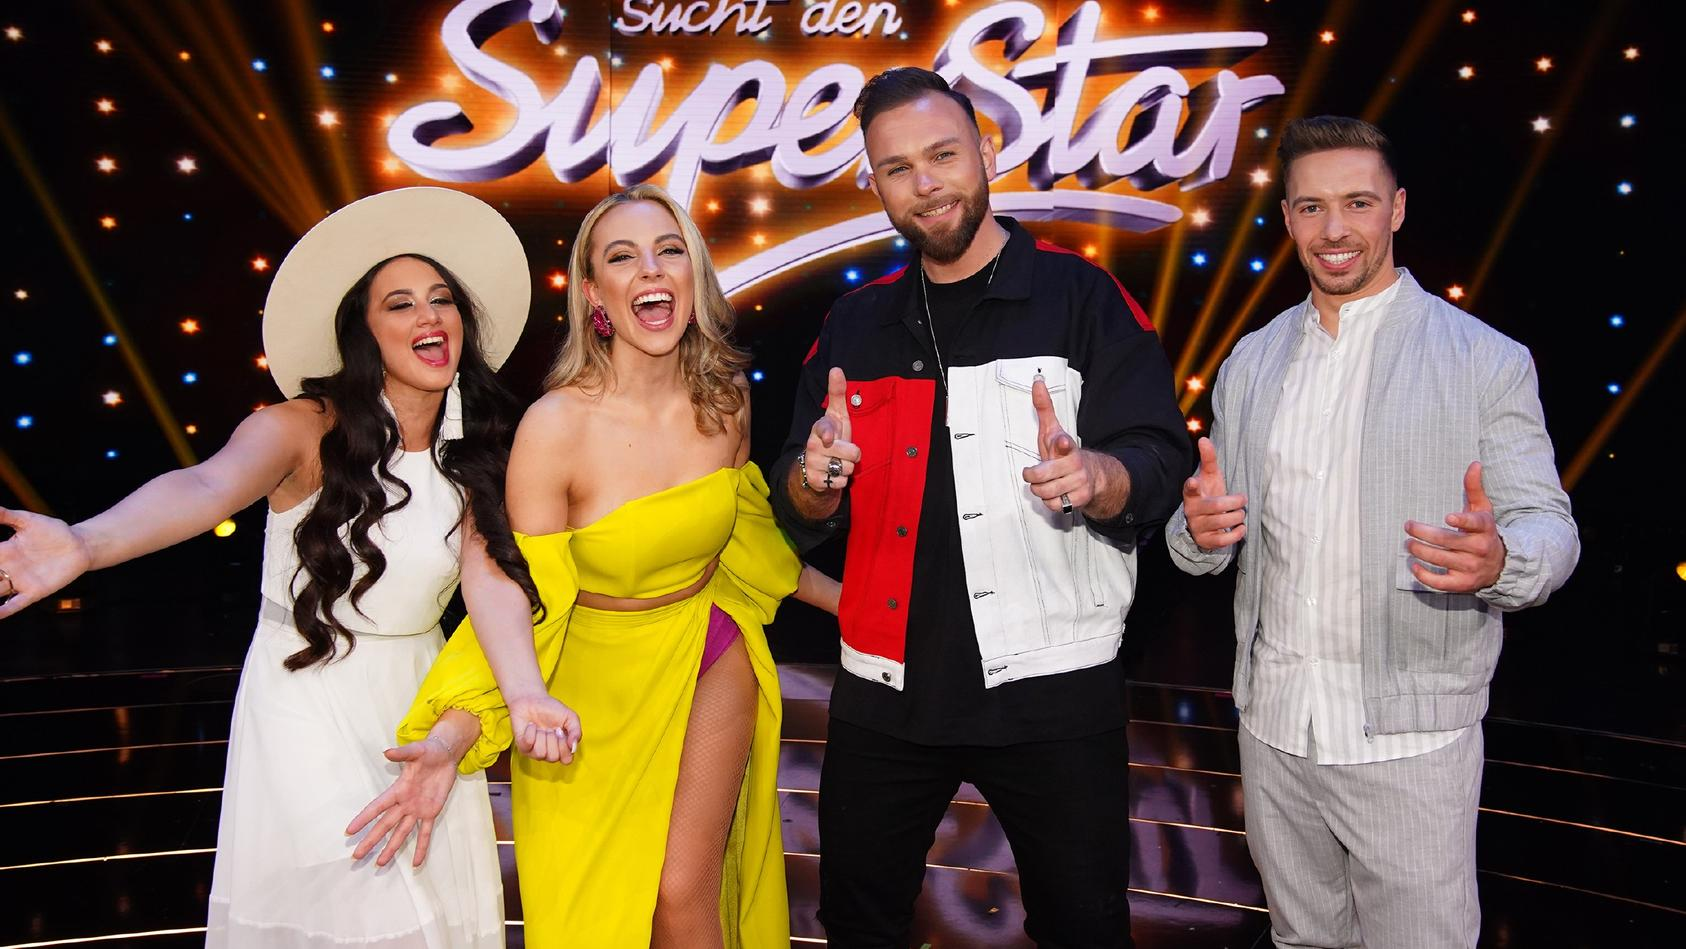 Chiara D'Amico, Paulina Wagner, Joshua Tappe und Ramon Roselly (Kaselowsky) singen im DSDS-Finale um den Superstar-Titel.